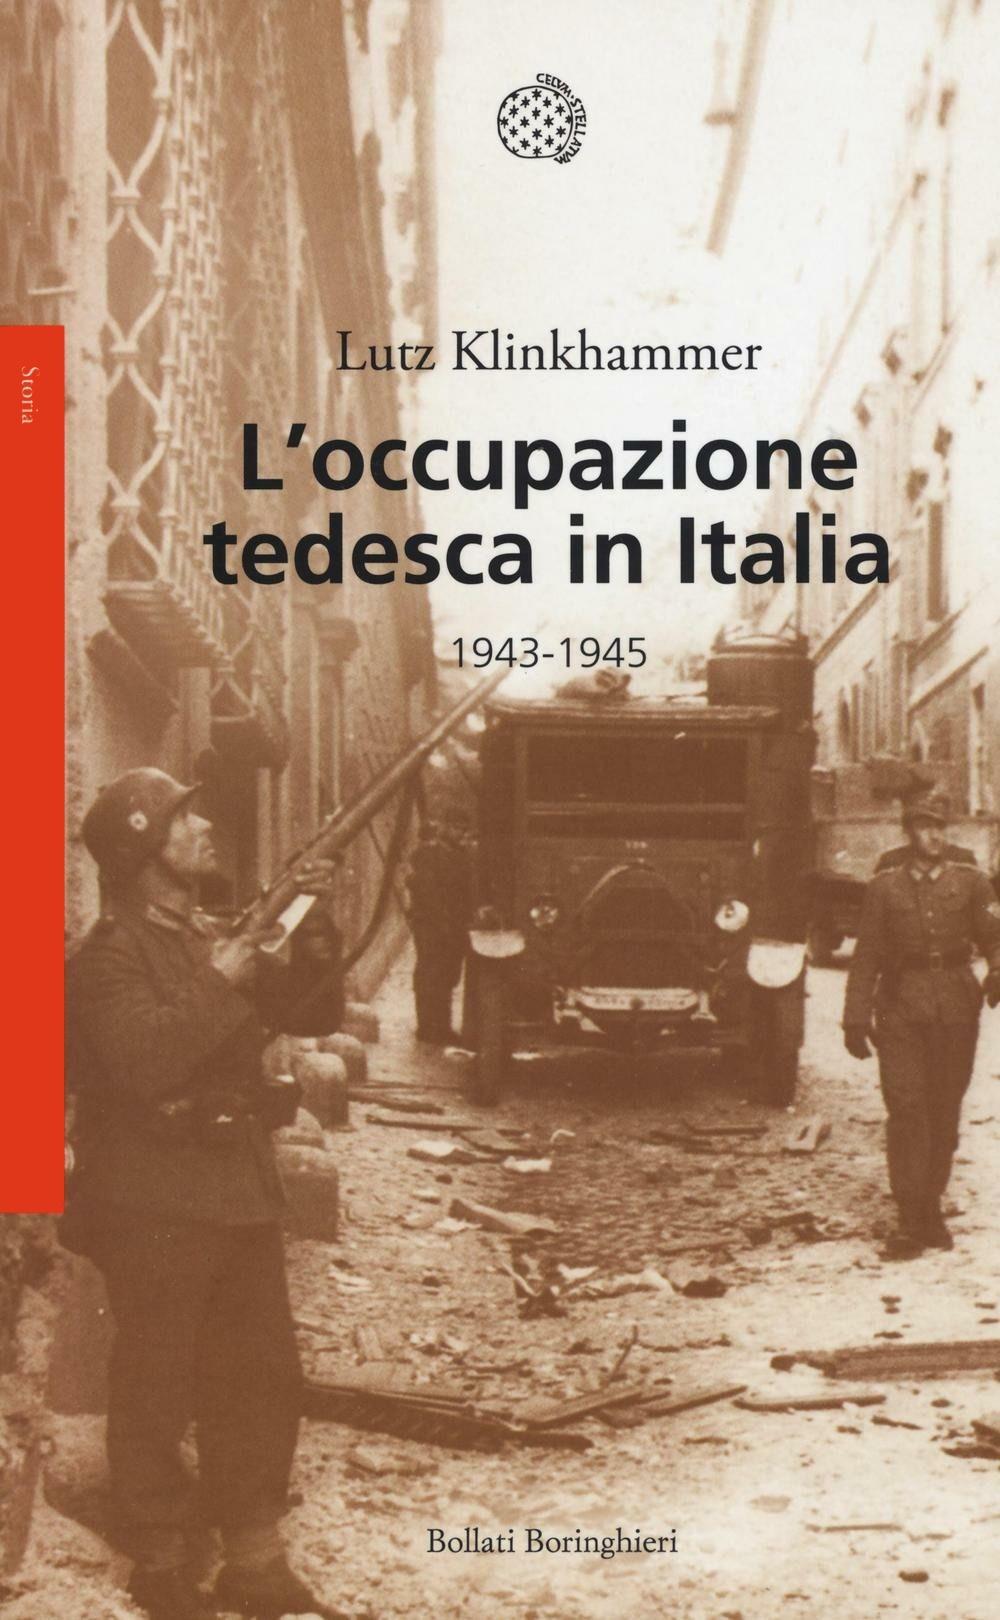 L'occupazione tedesca in Italia. 1943-1945.